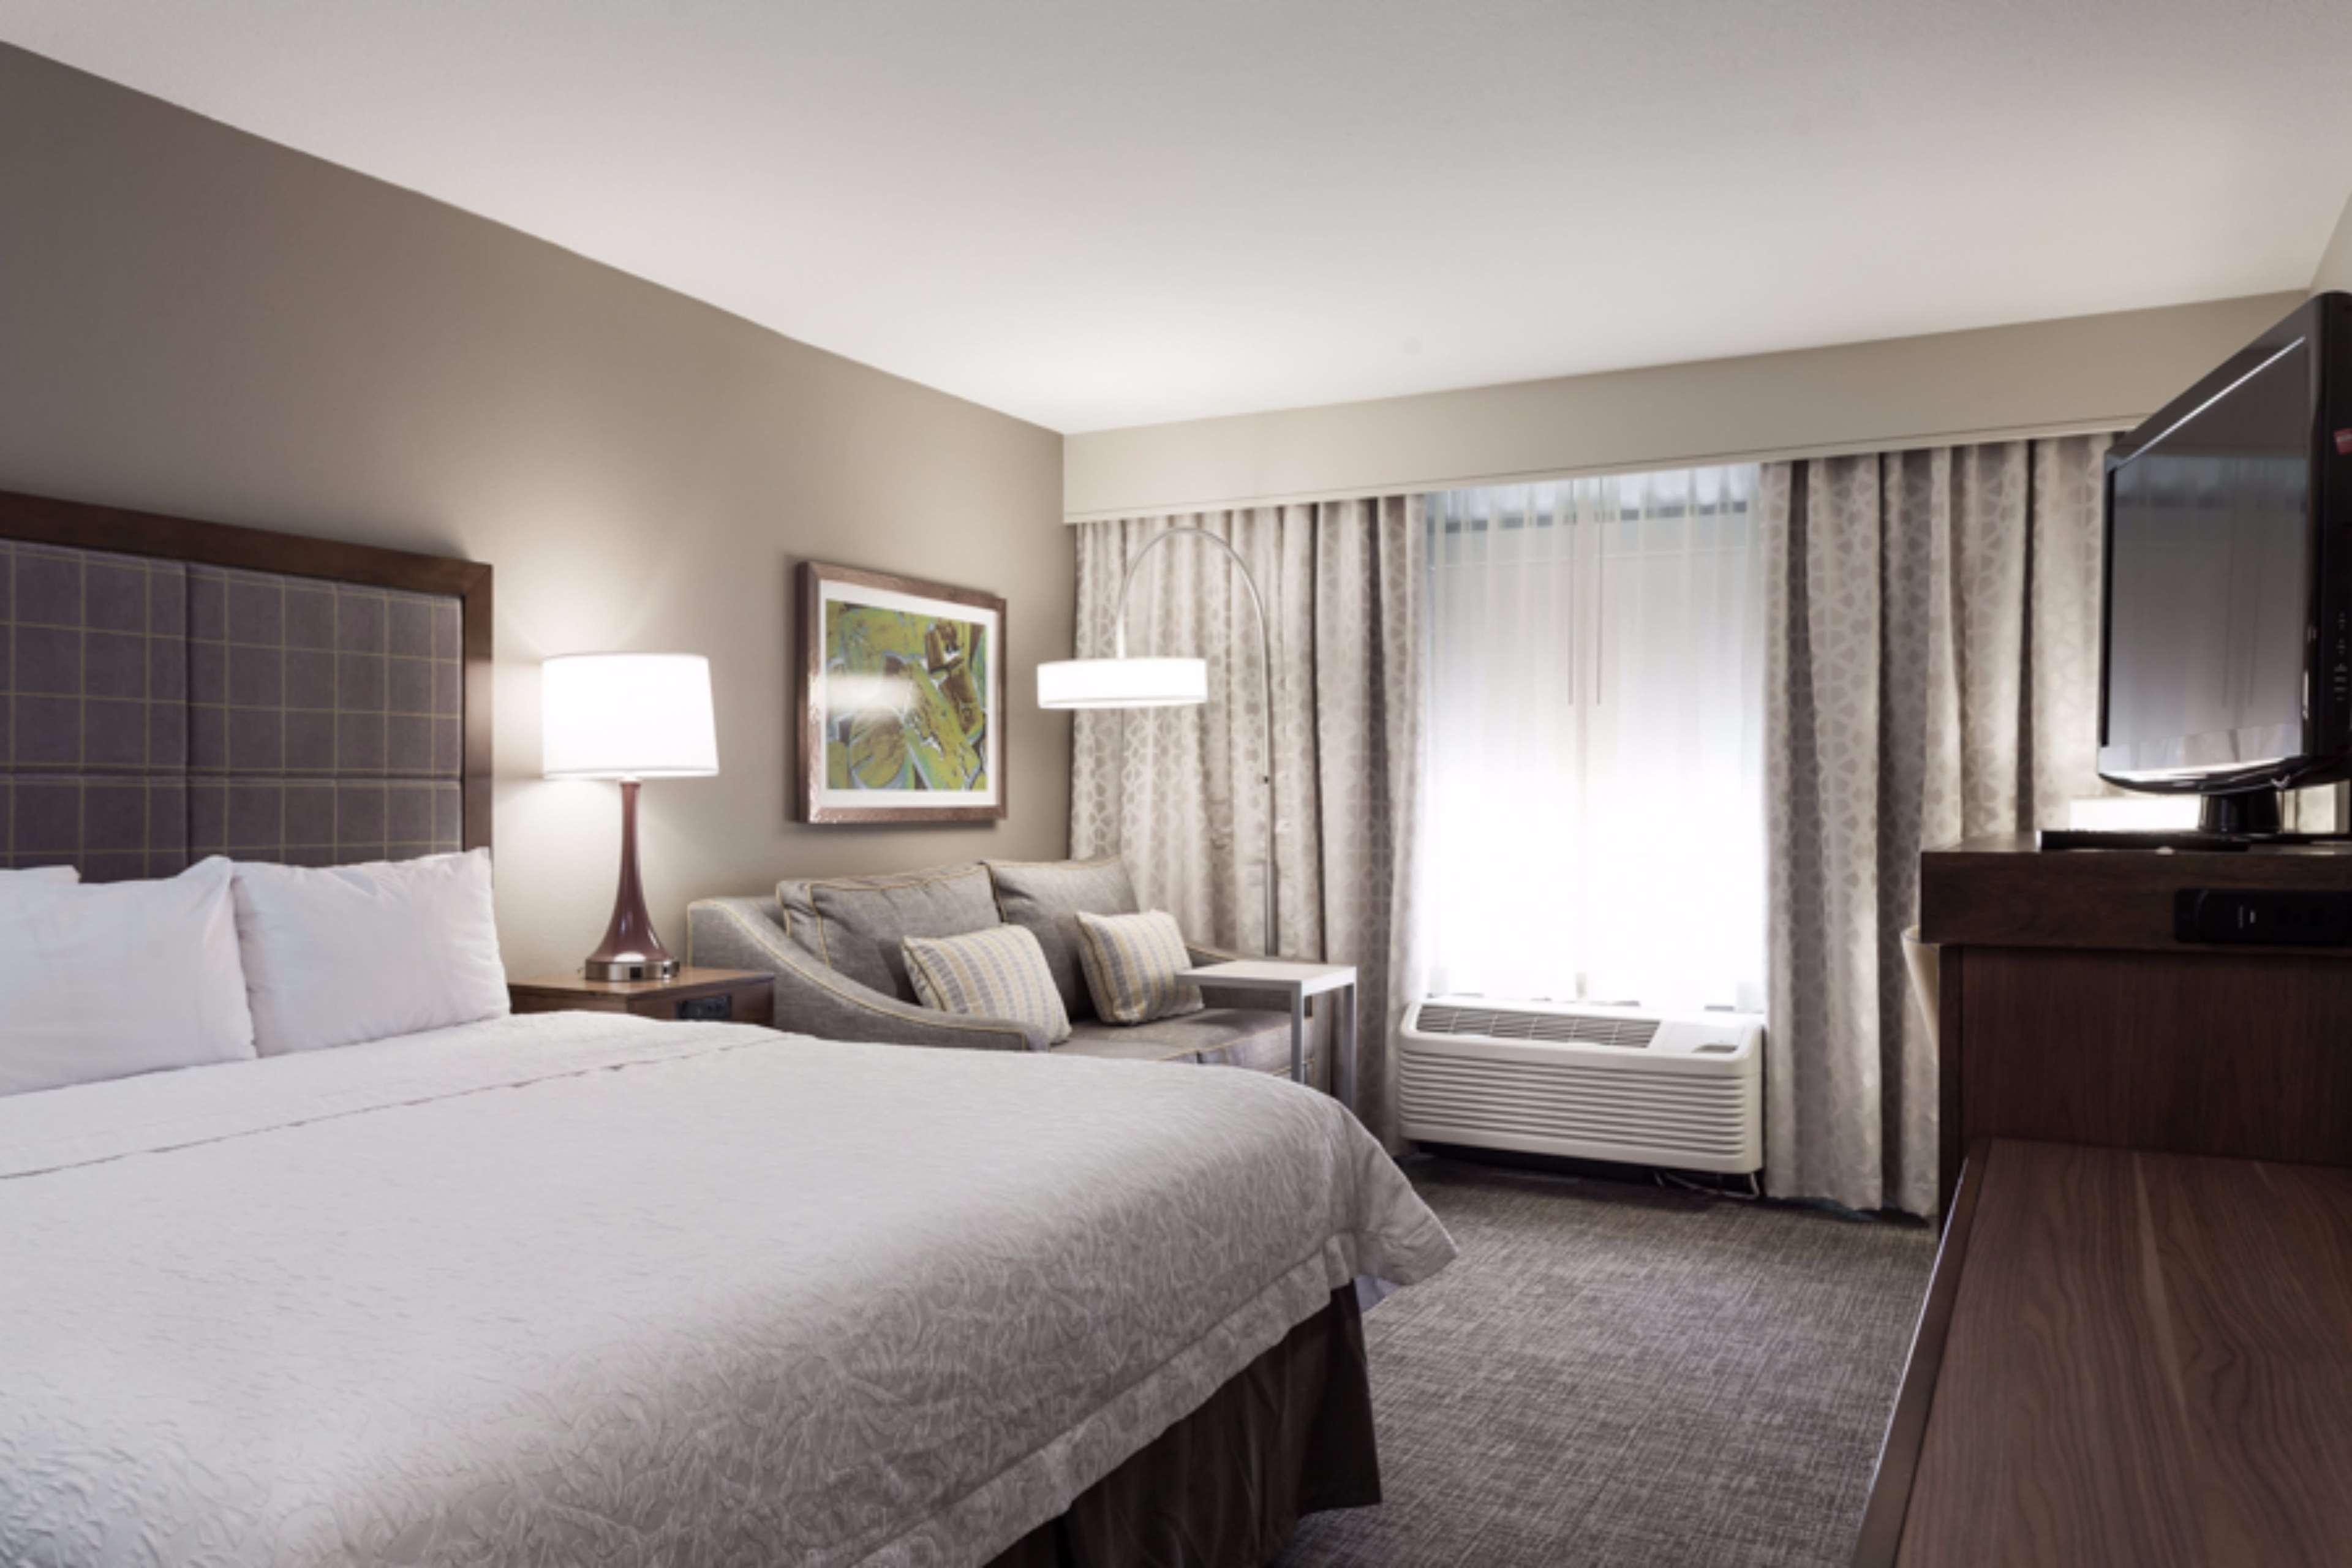 Hampton Inn & Suites Dallas-DFW Airport North-Grapevine image 17